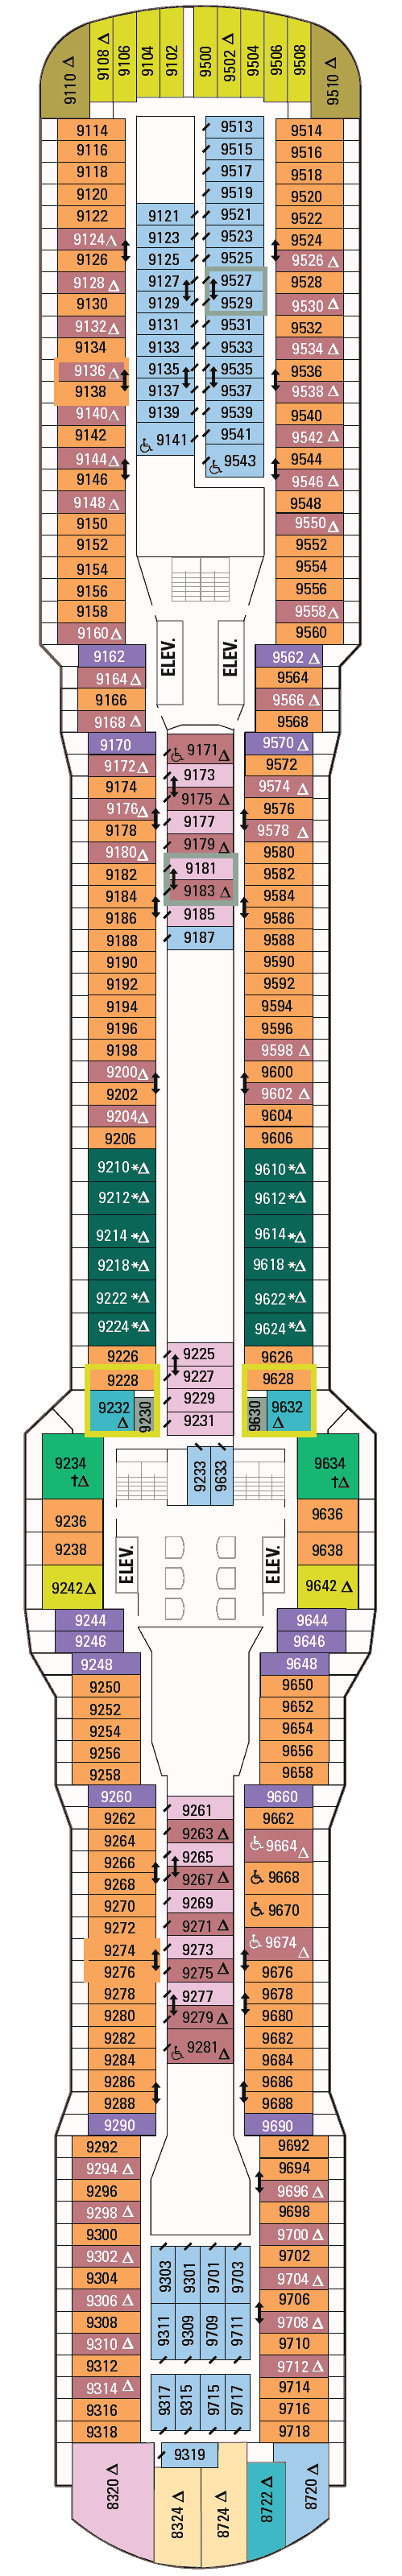 Ovation of the Seas Deck 9